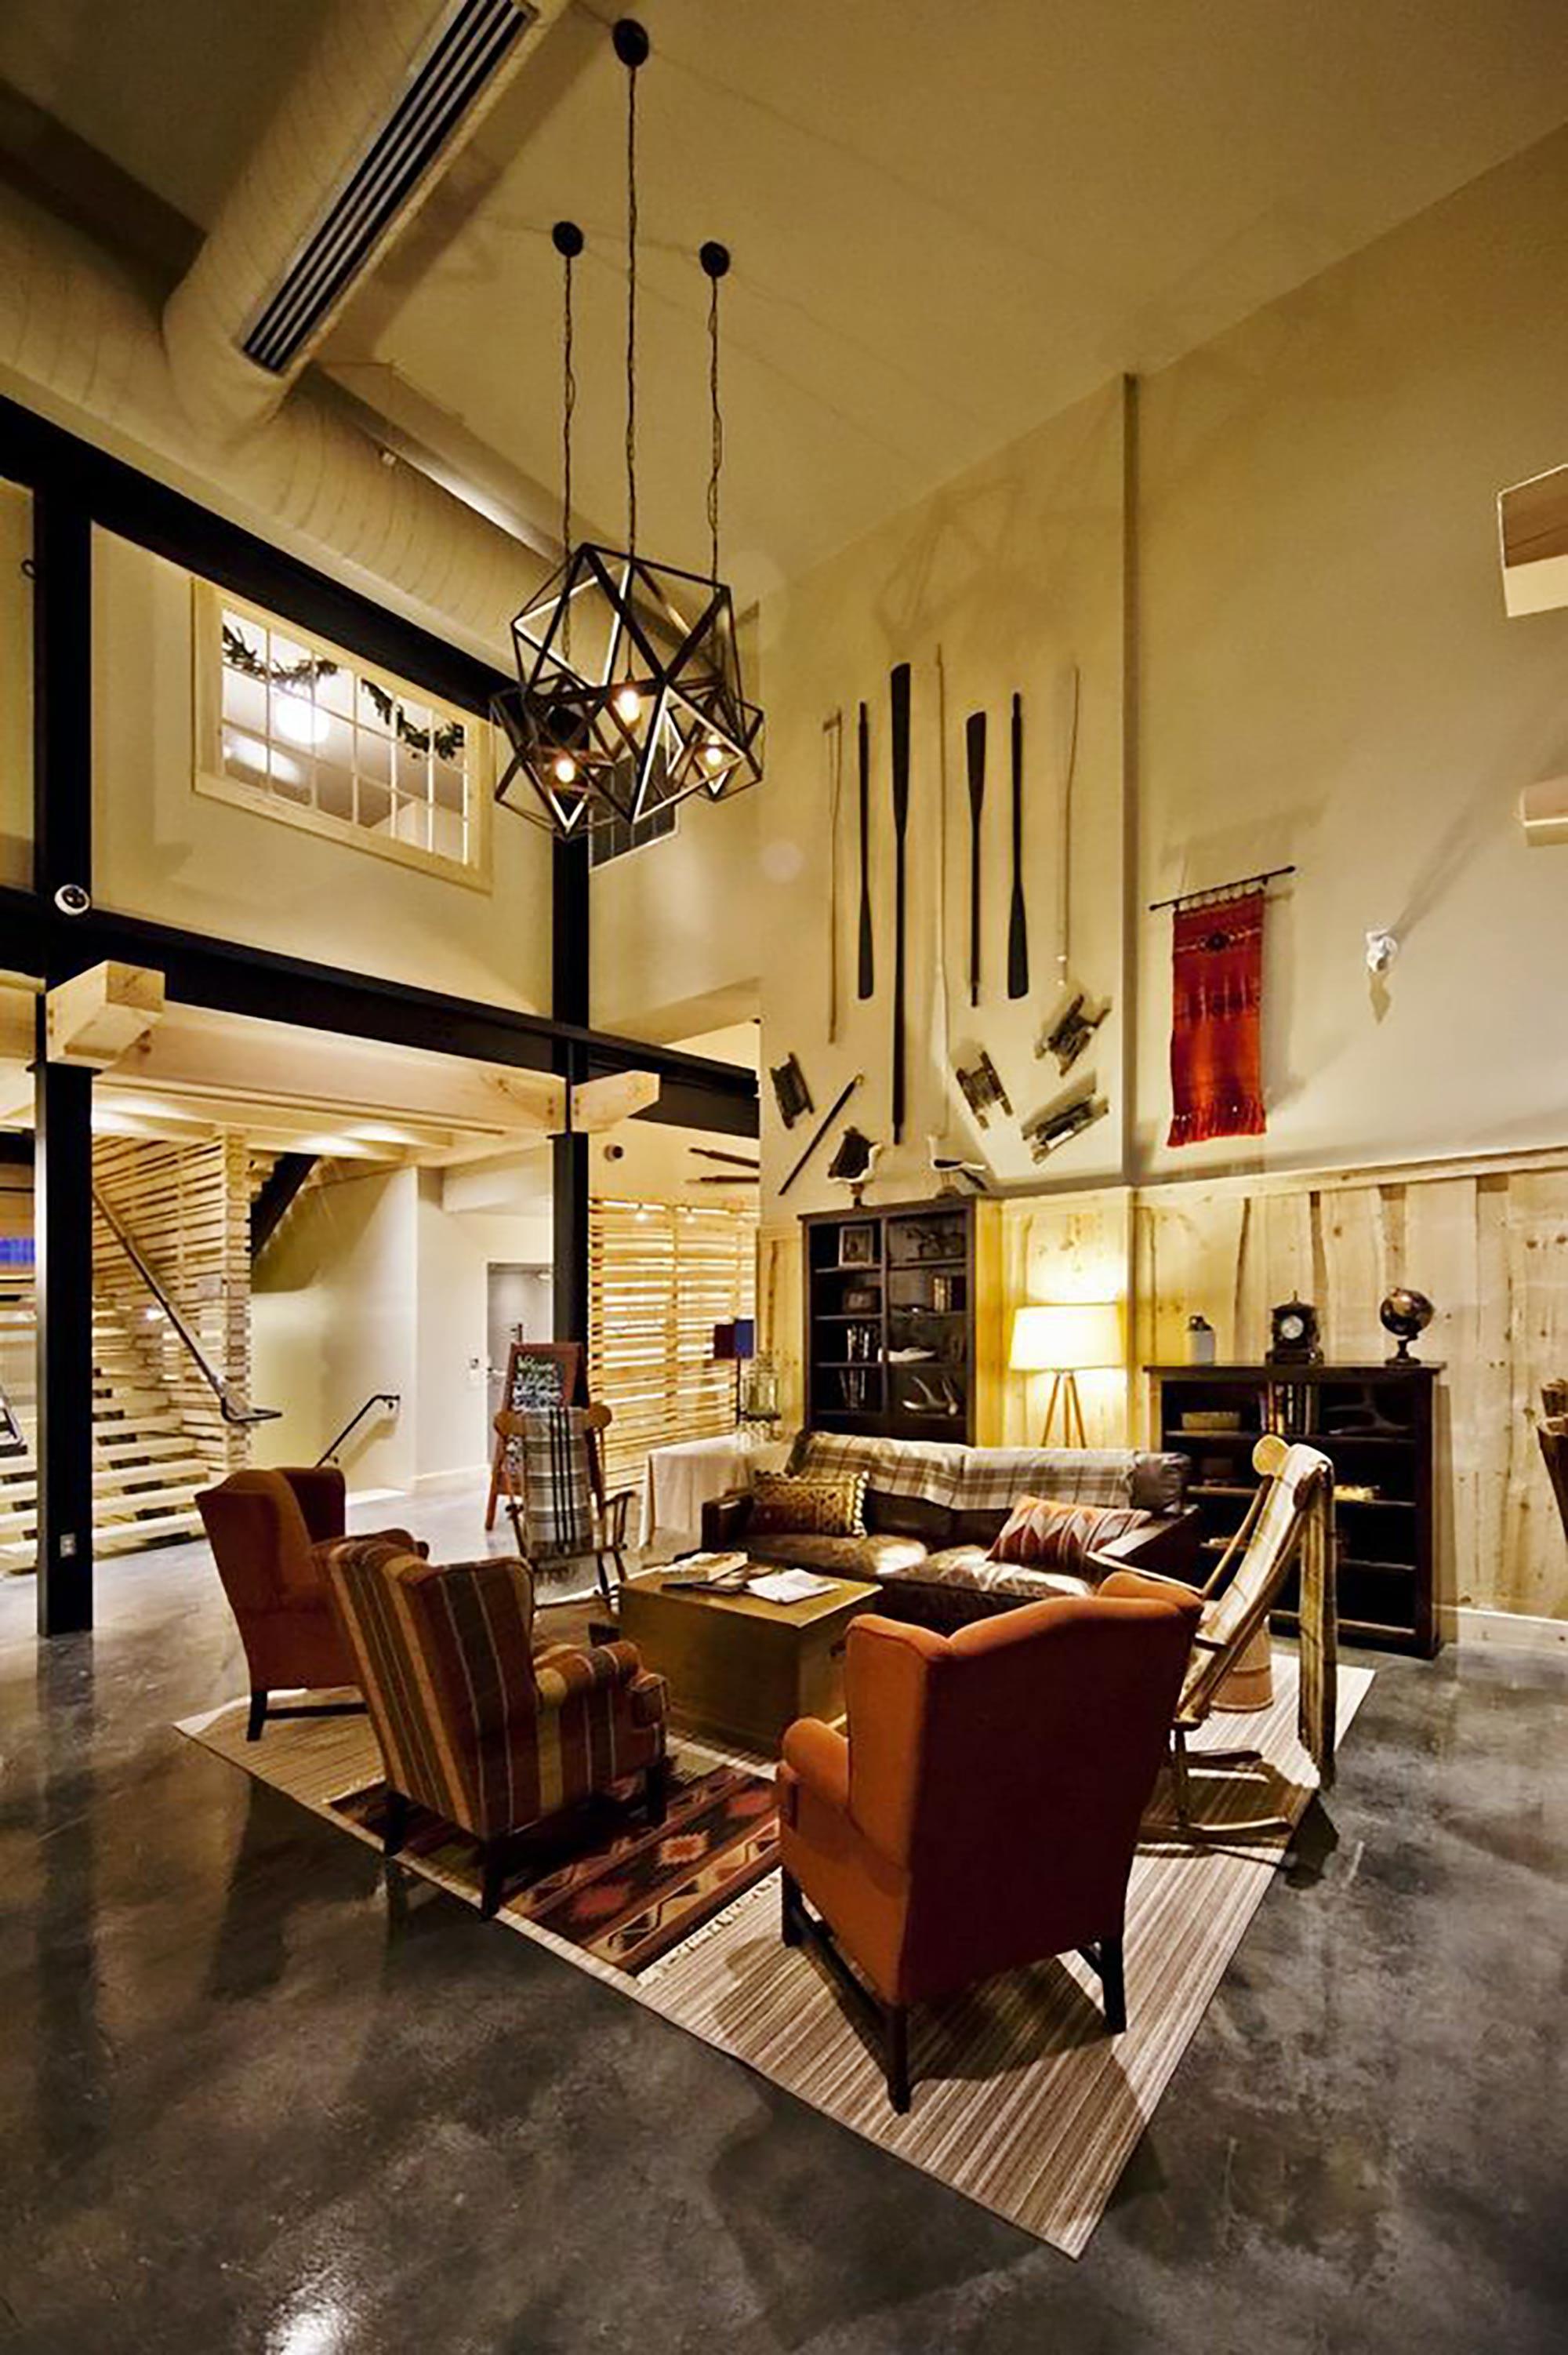 interior-design-nova-scotia-resort-common-area.jpg